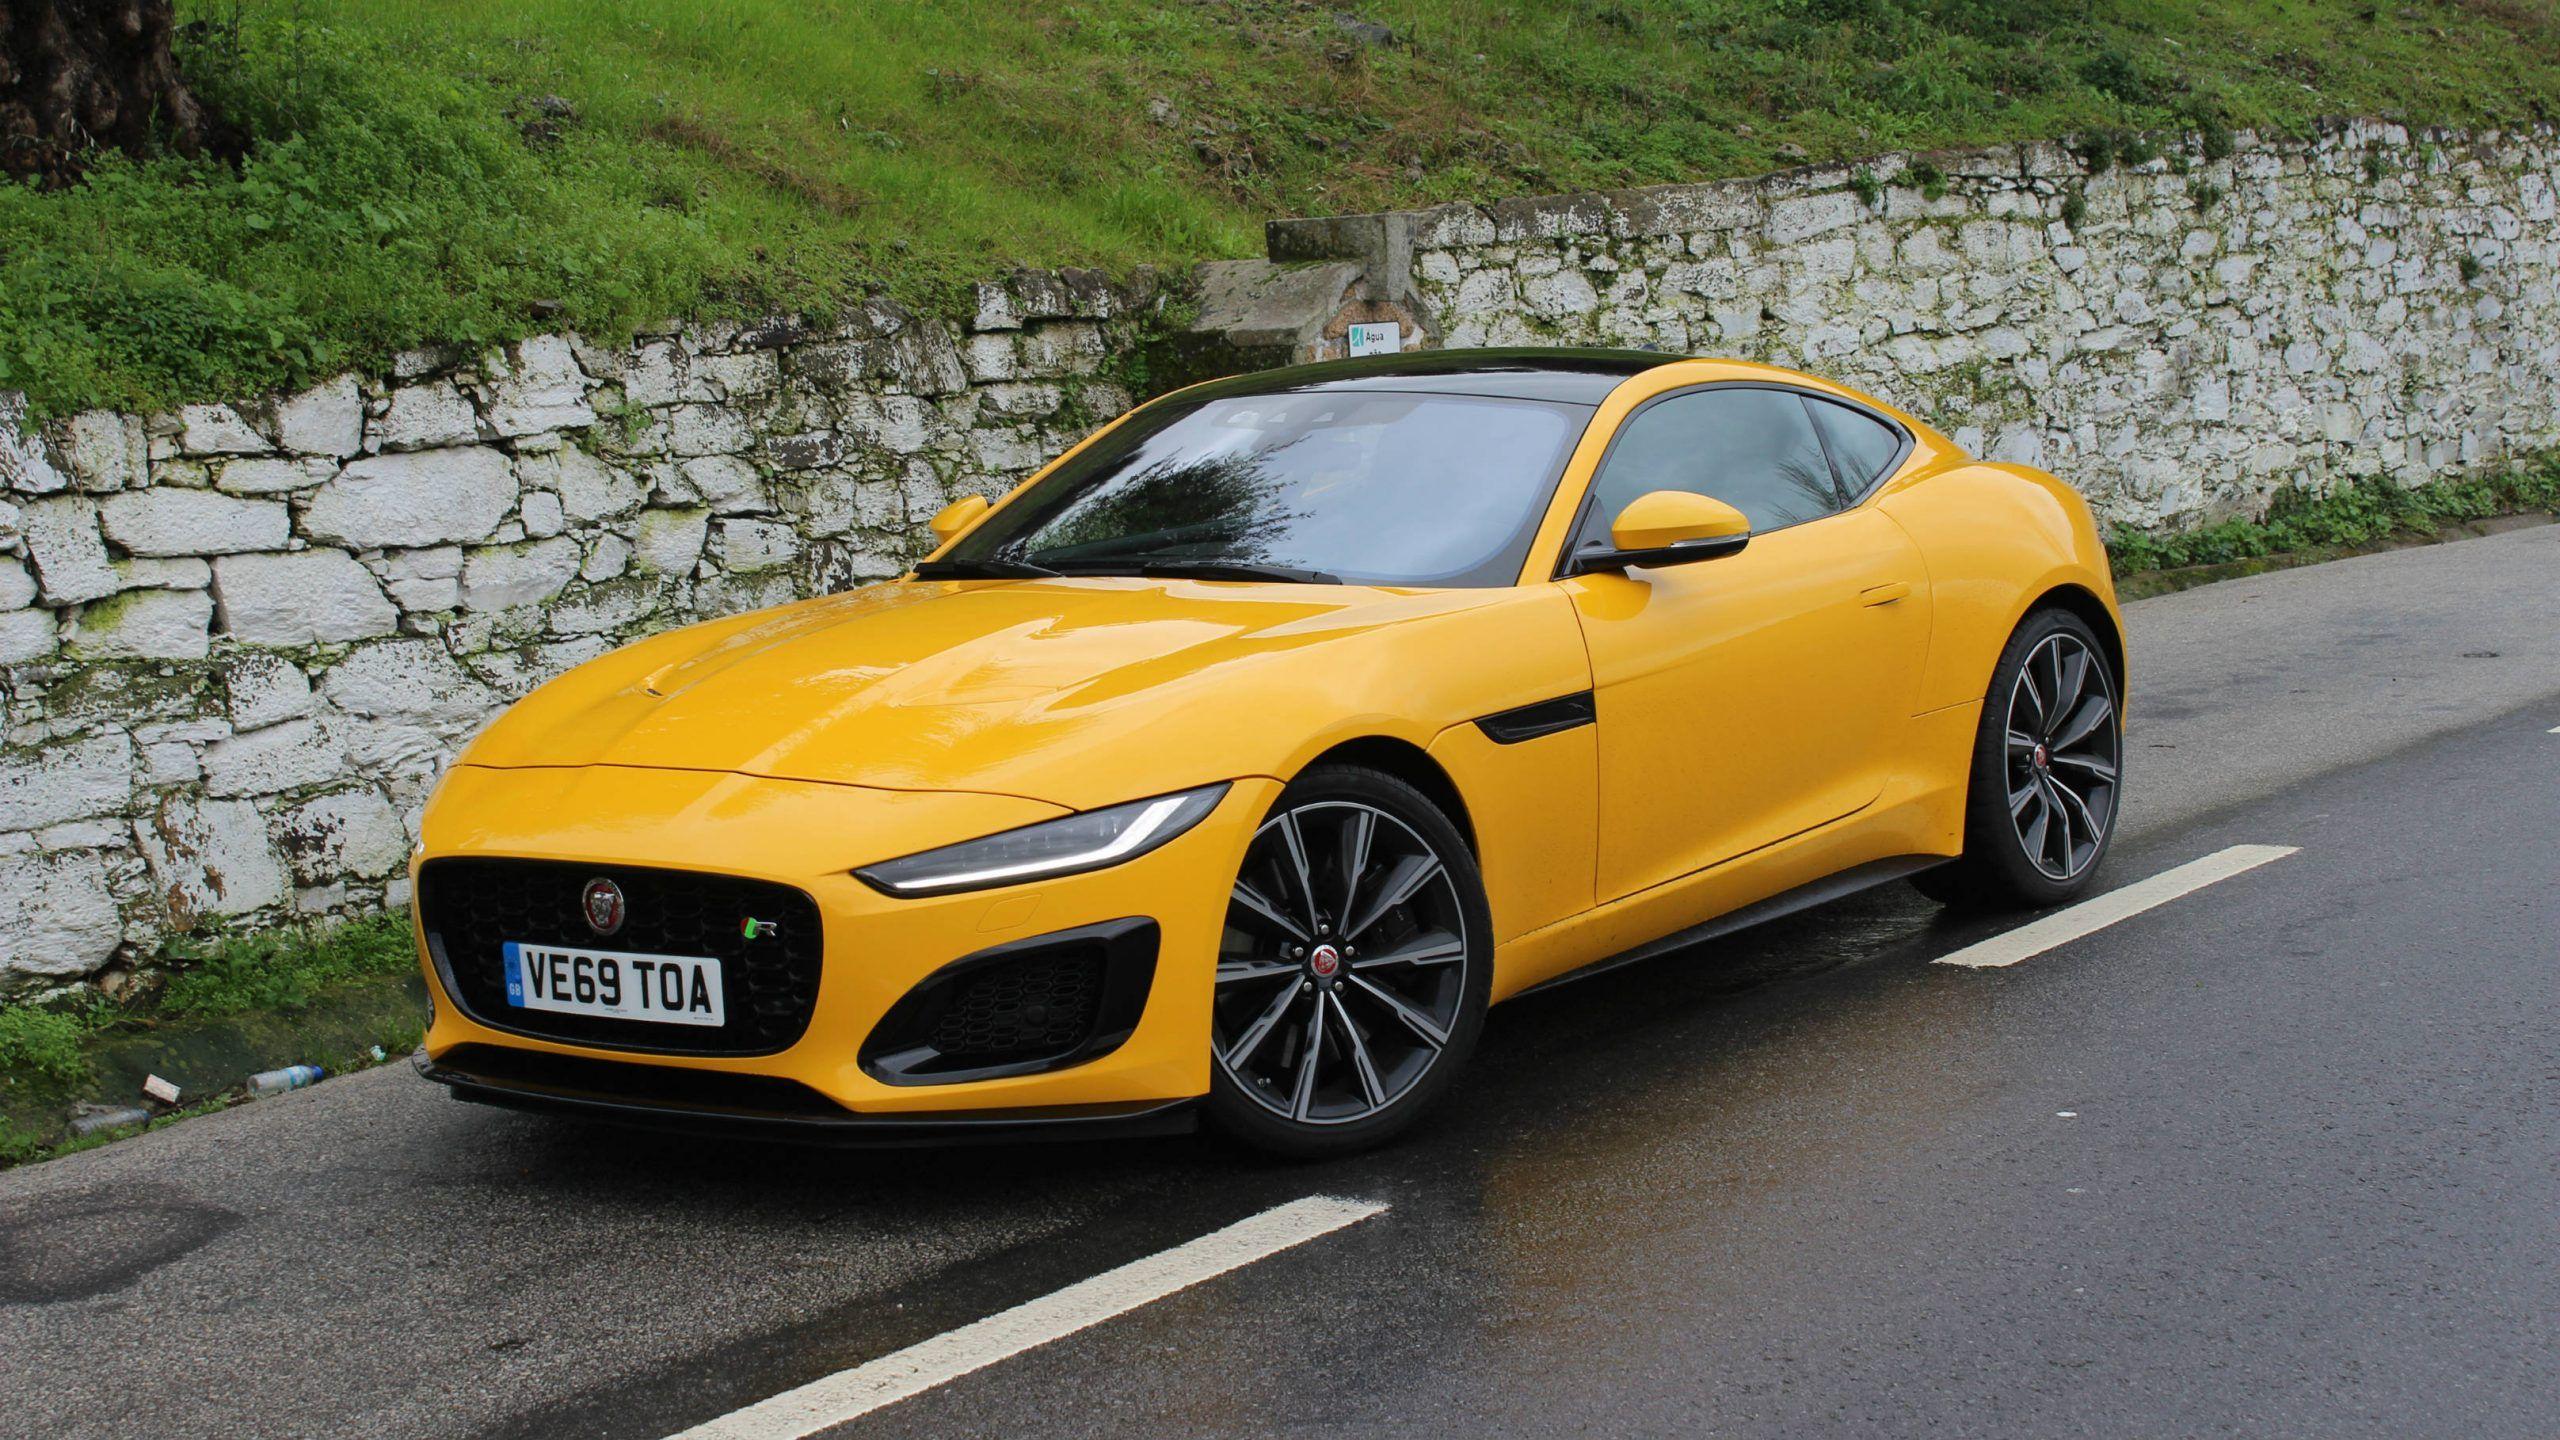 2021 Jaguar Msrp Images Jaguar F Type Jaguar Models New Jaguar